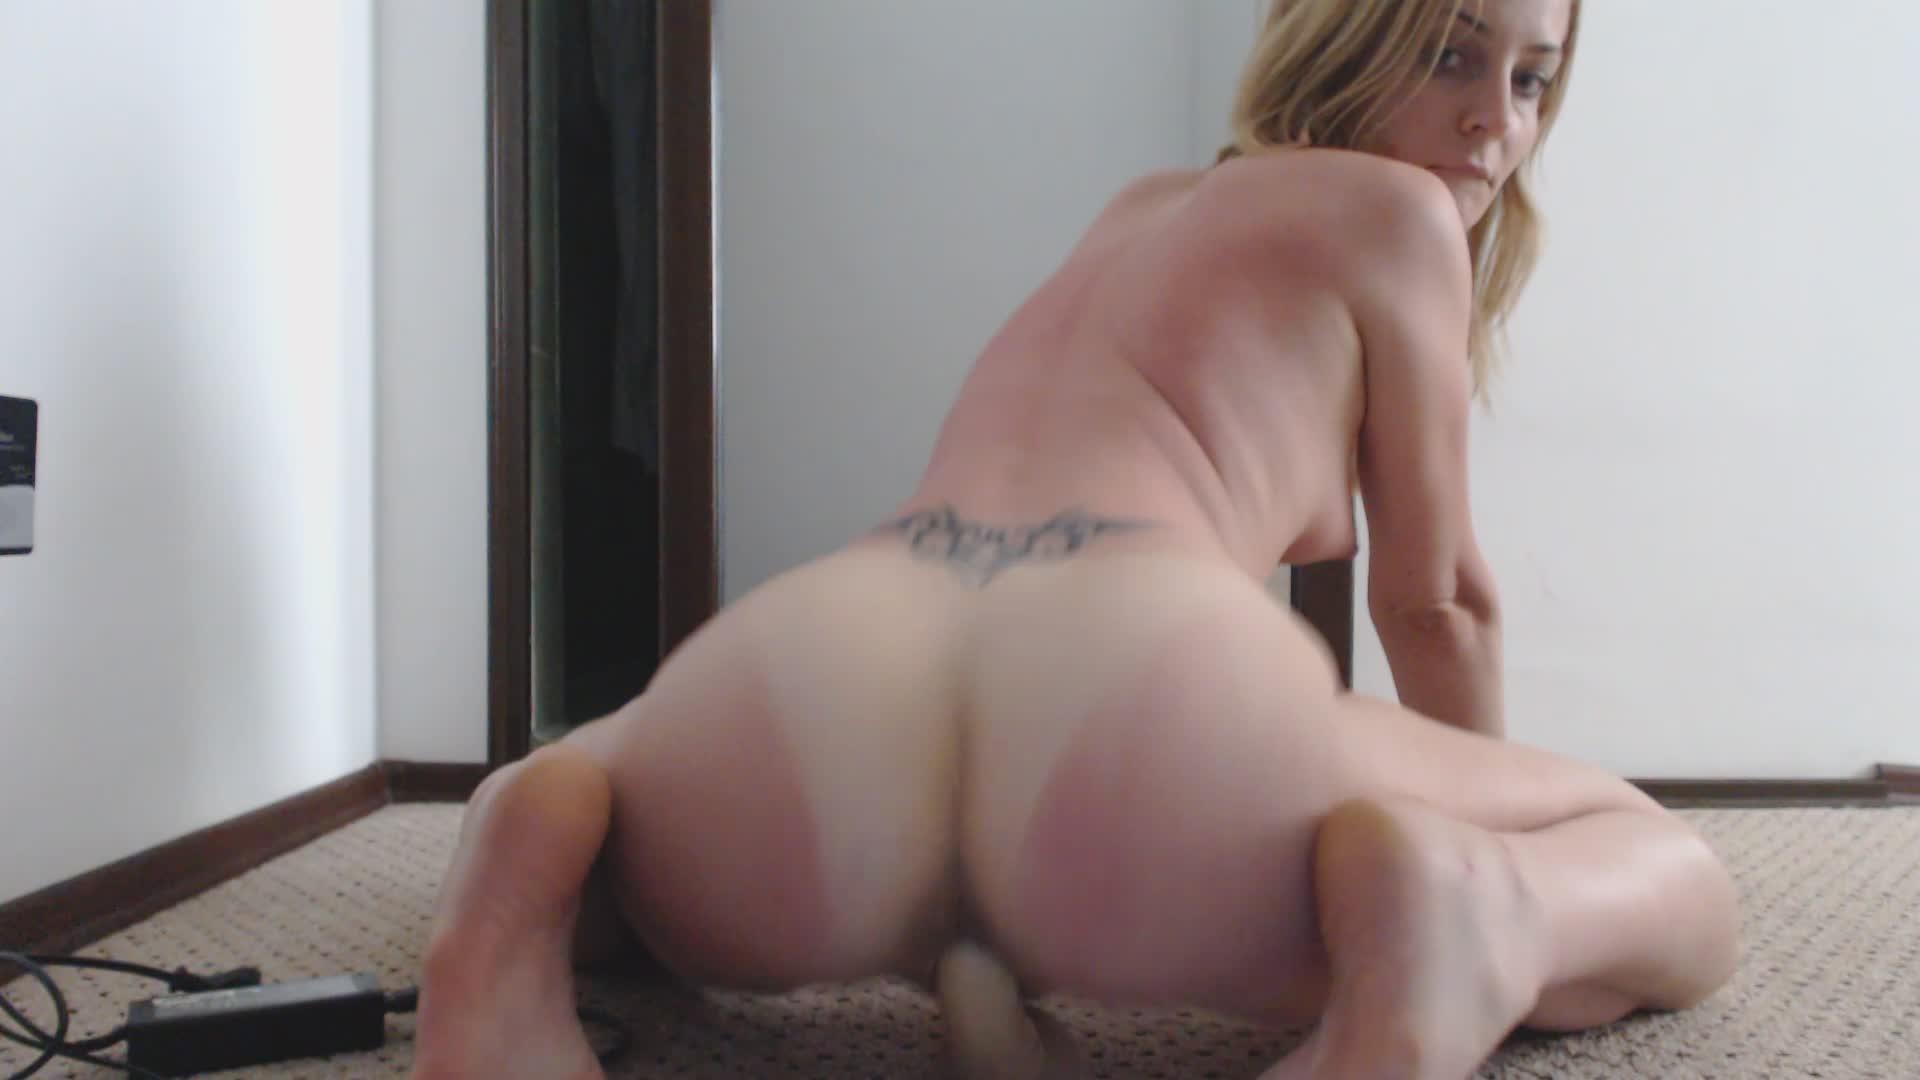 Big Tits Huge Dildo Ride